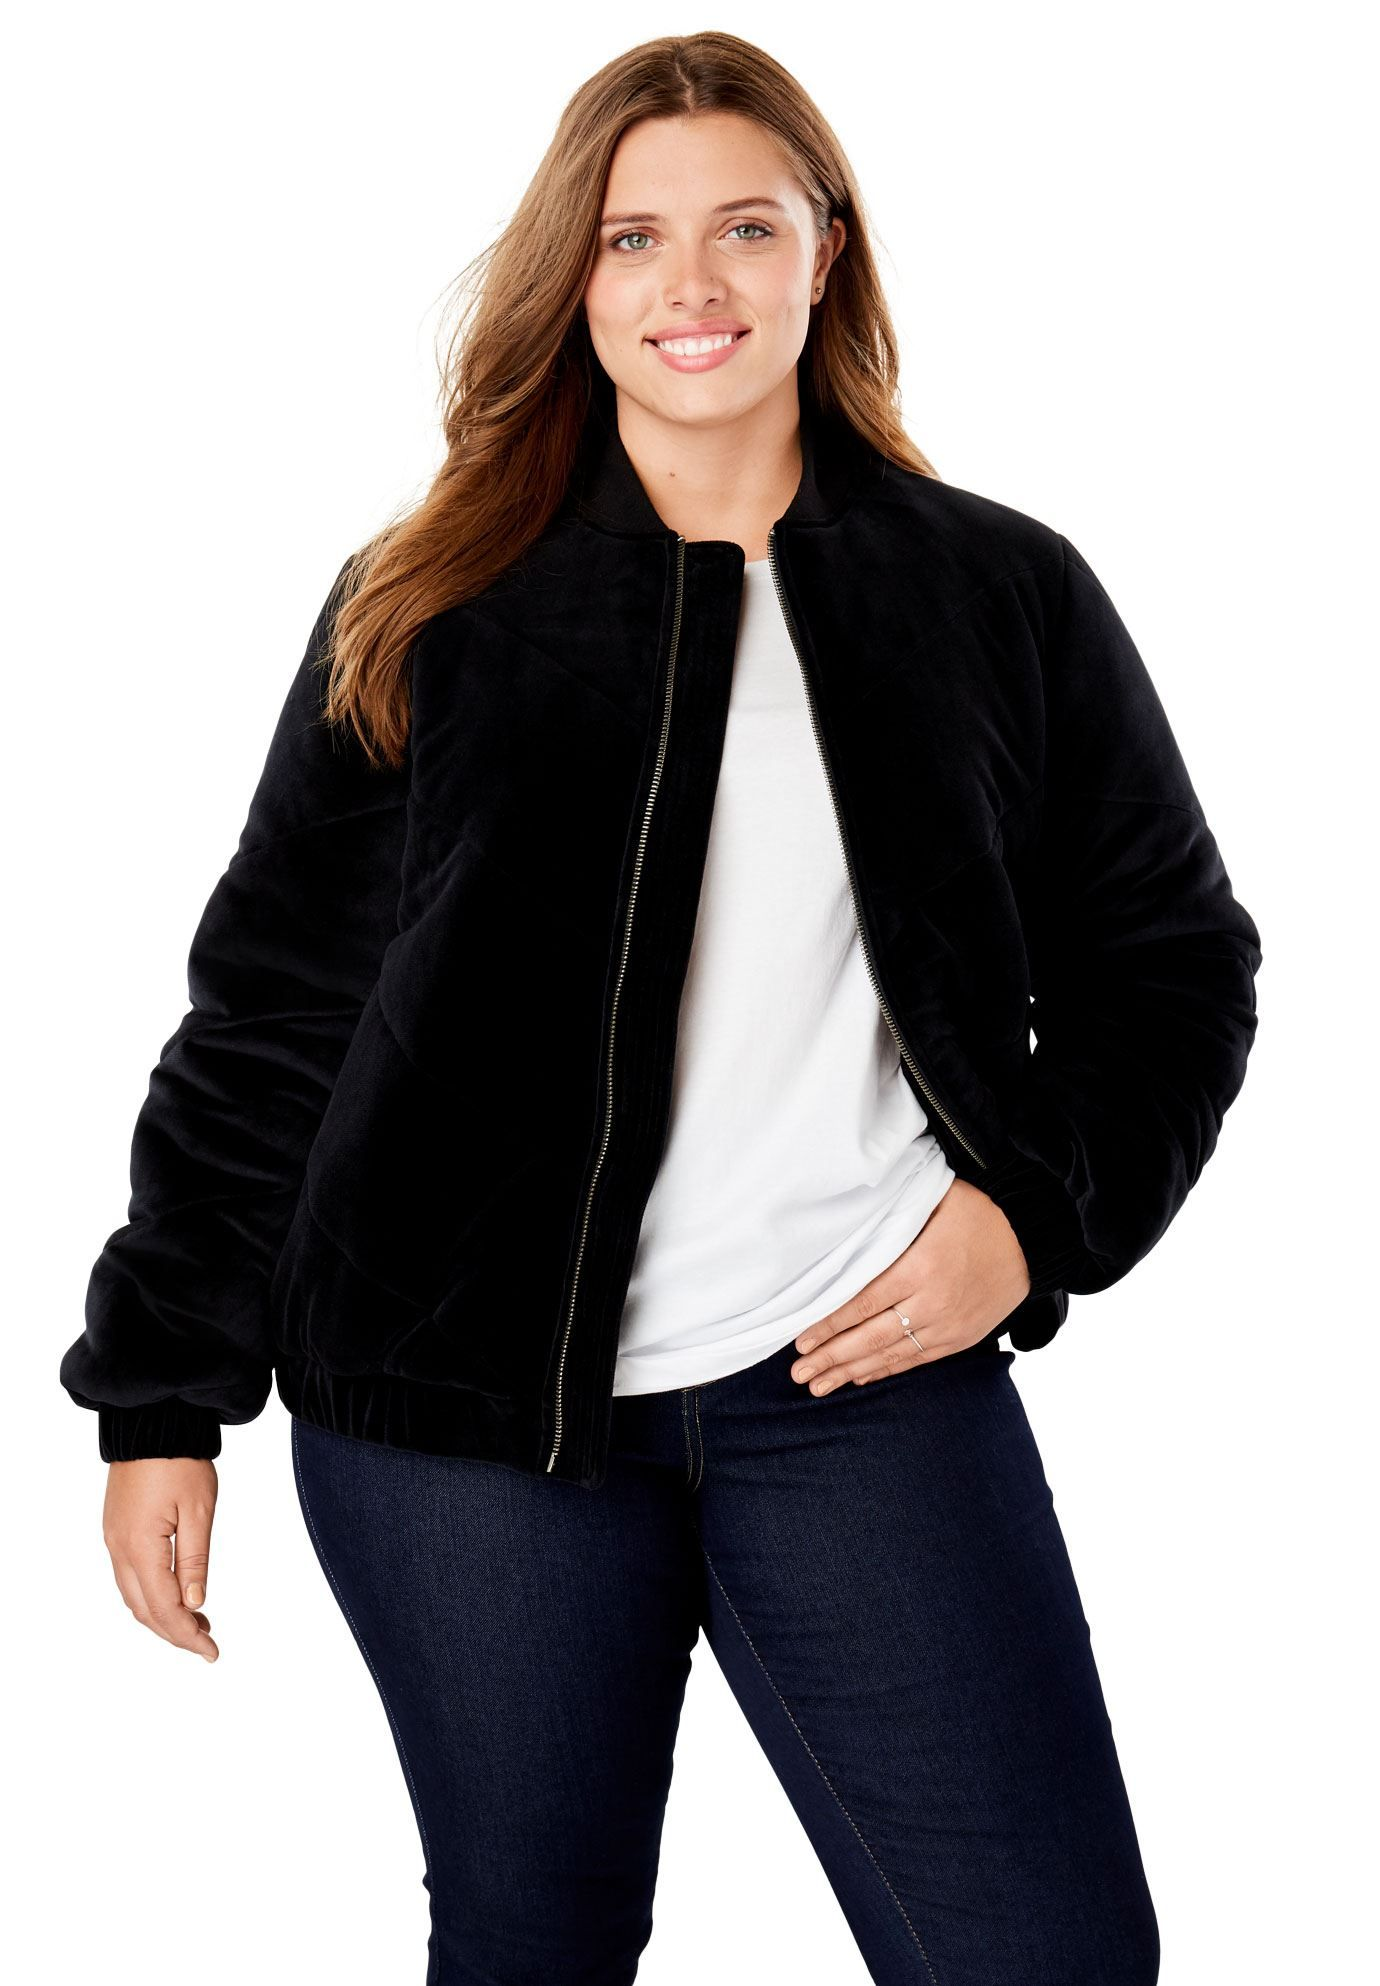 0580bbfa9e8 Velour Chevron-Quilted Puffer Jacket - Women s Plus Size Clothing ...